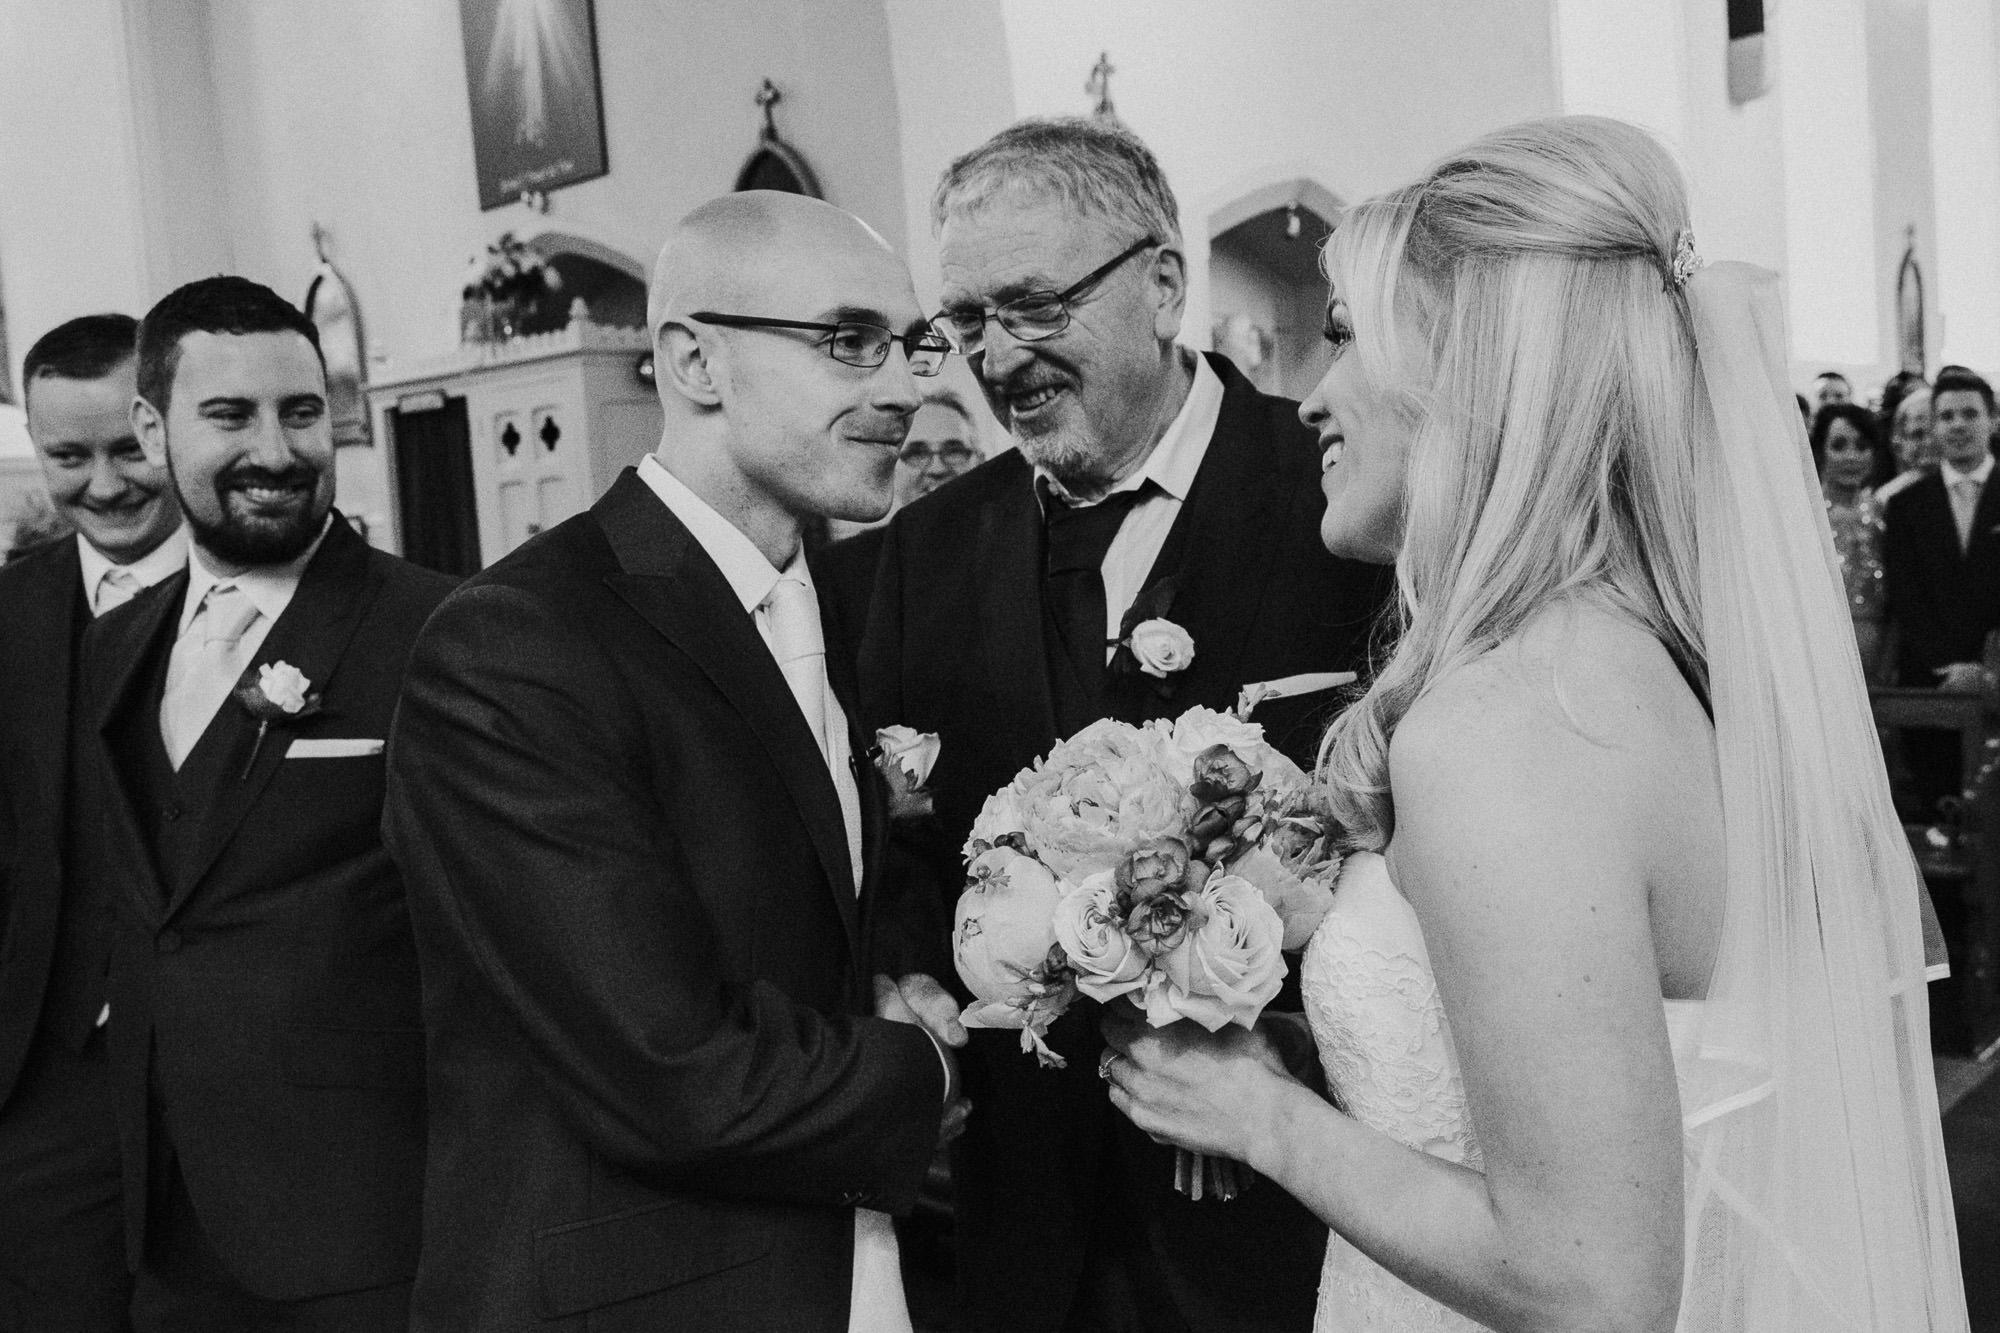 CLAIREBYRNEPHOTOGRAPHY-WEDDING-Ireland-tulffaris-alternative-fun-Lisa-terry-3.jpg